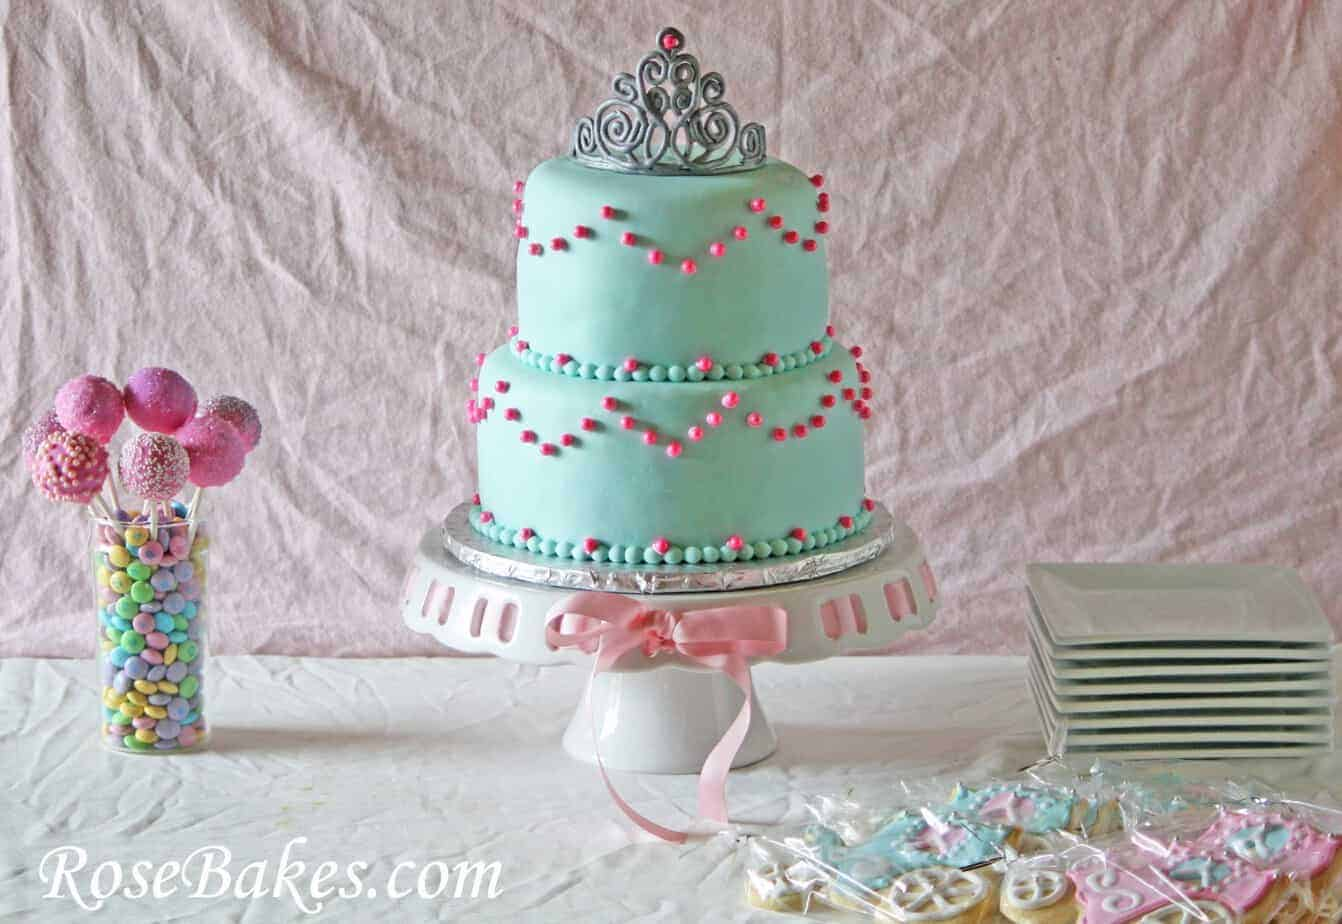 Princess Birthday Tiara Cake Carriage Cookies u0026 Sparkley Pink Cake Pops! & Princess Birthday: Tiara Cake Carriage Cookies u0026 Sparkley Pink ...